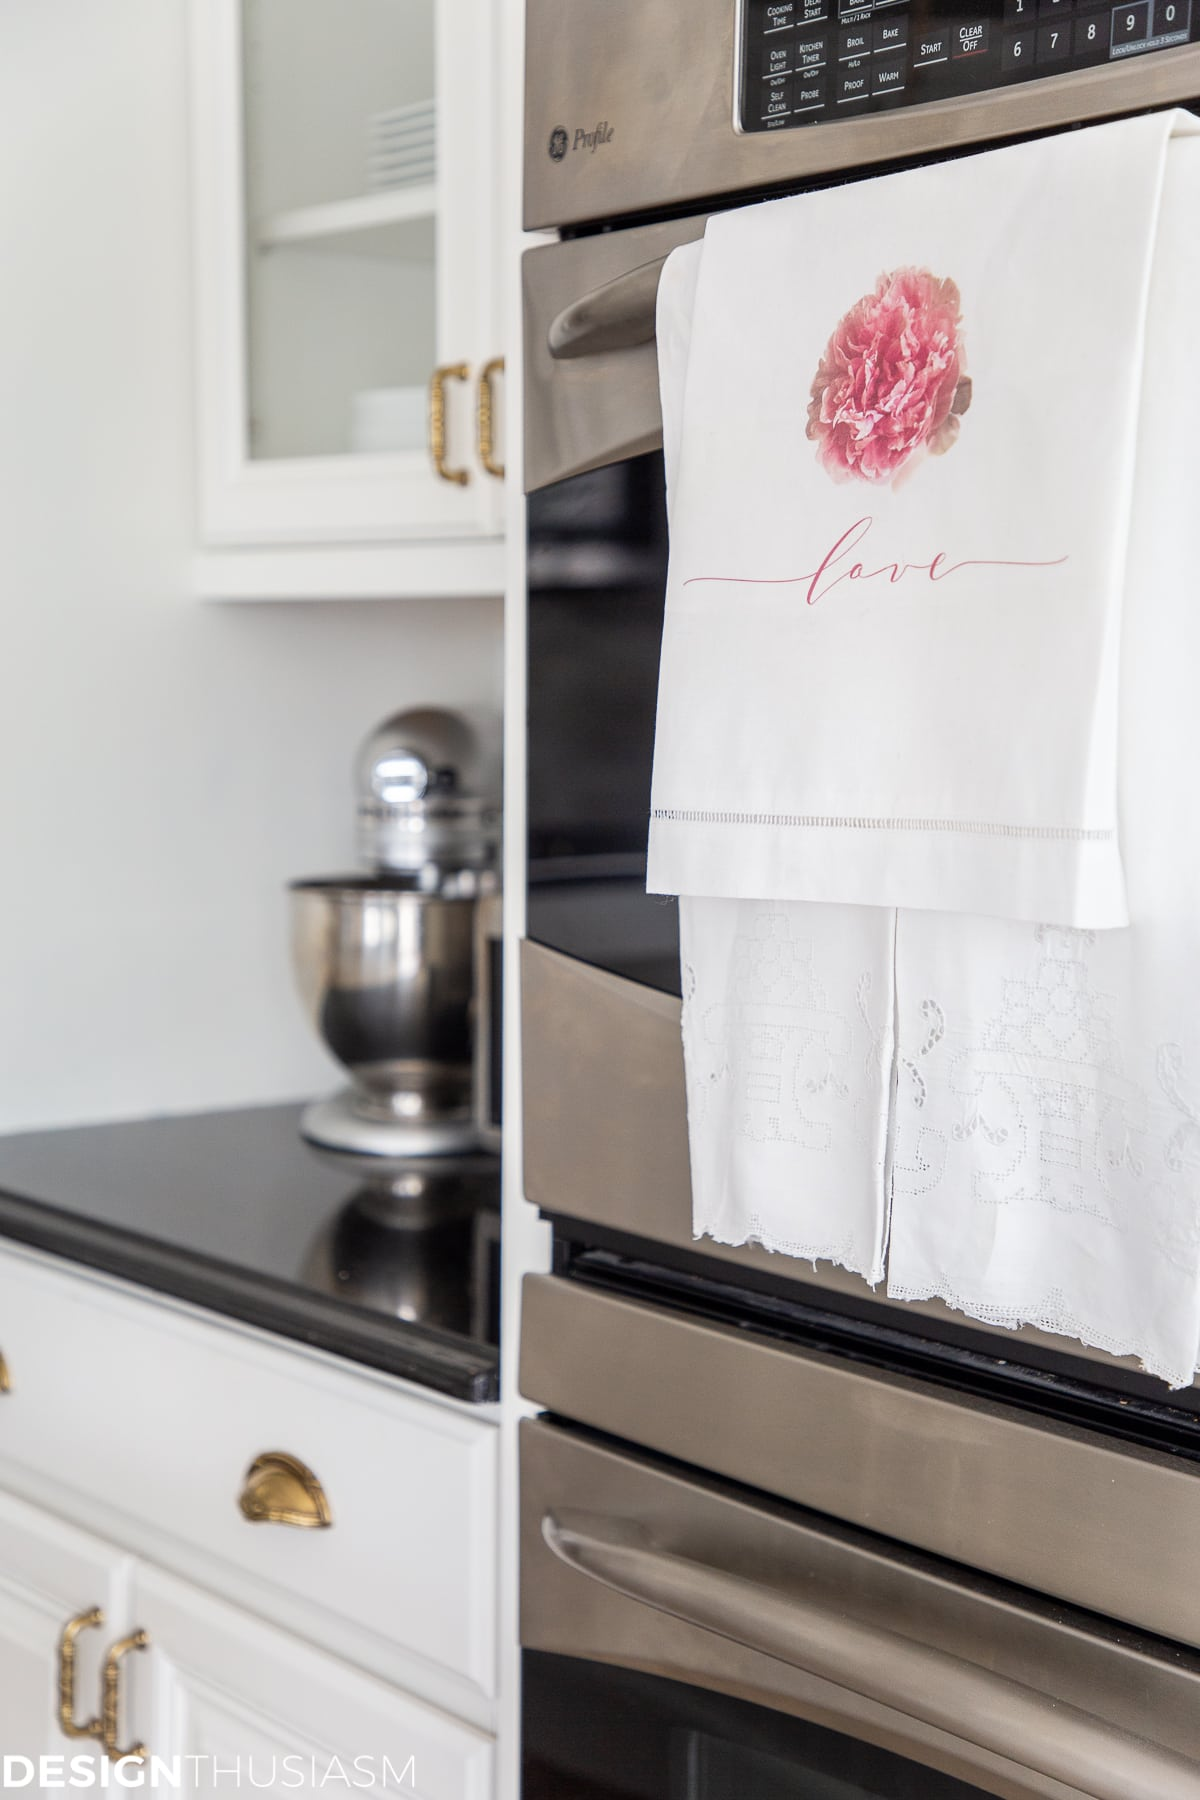 peony love tea towel valentines day decor